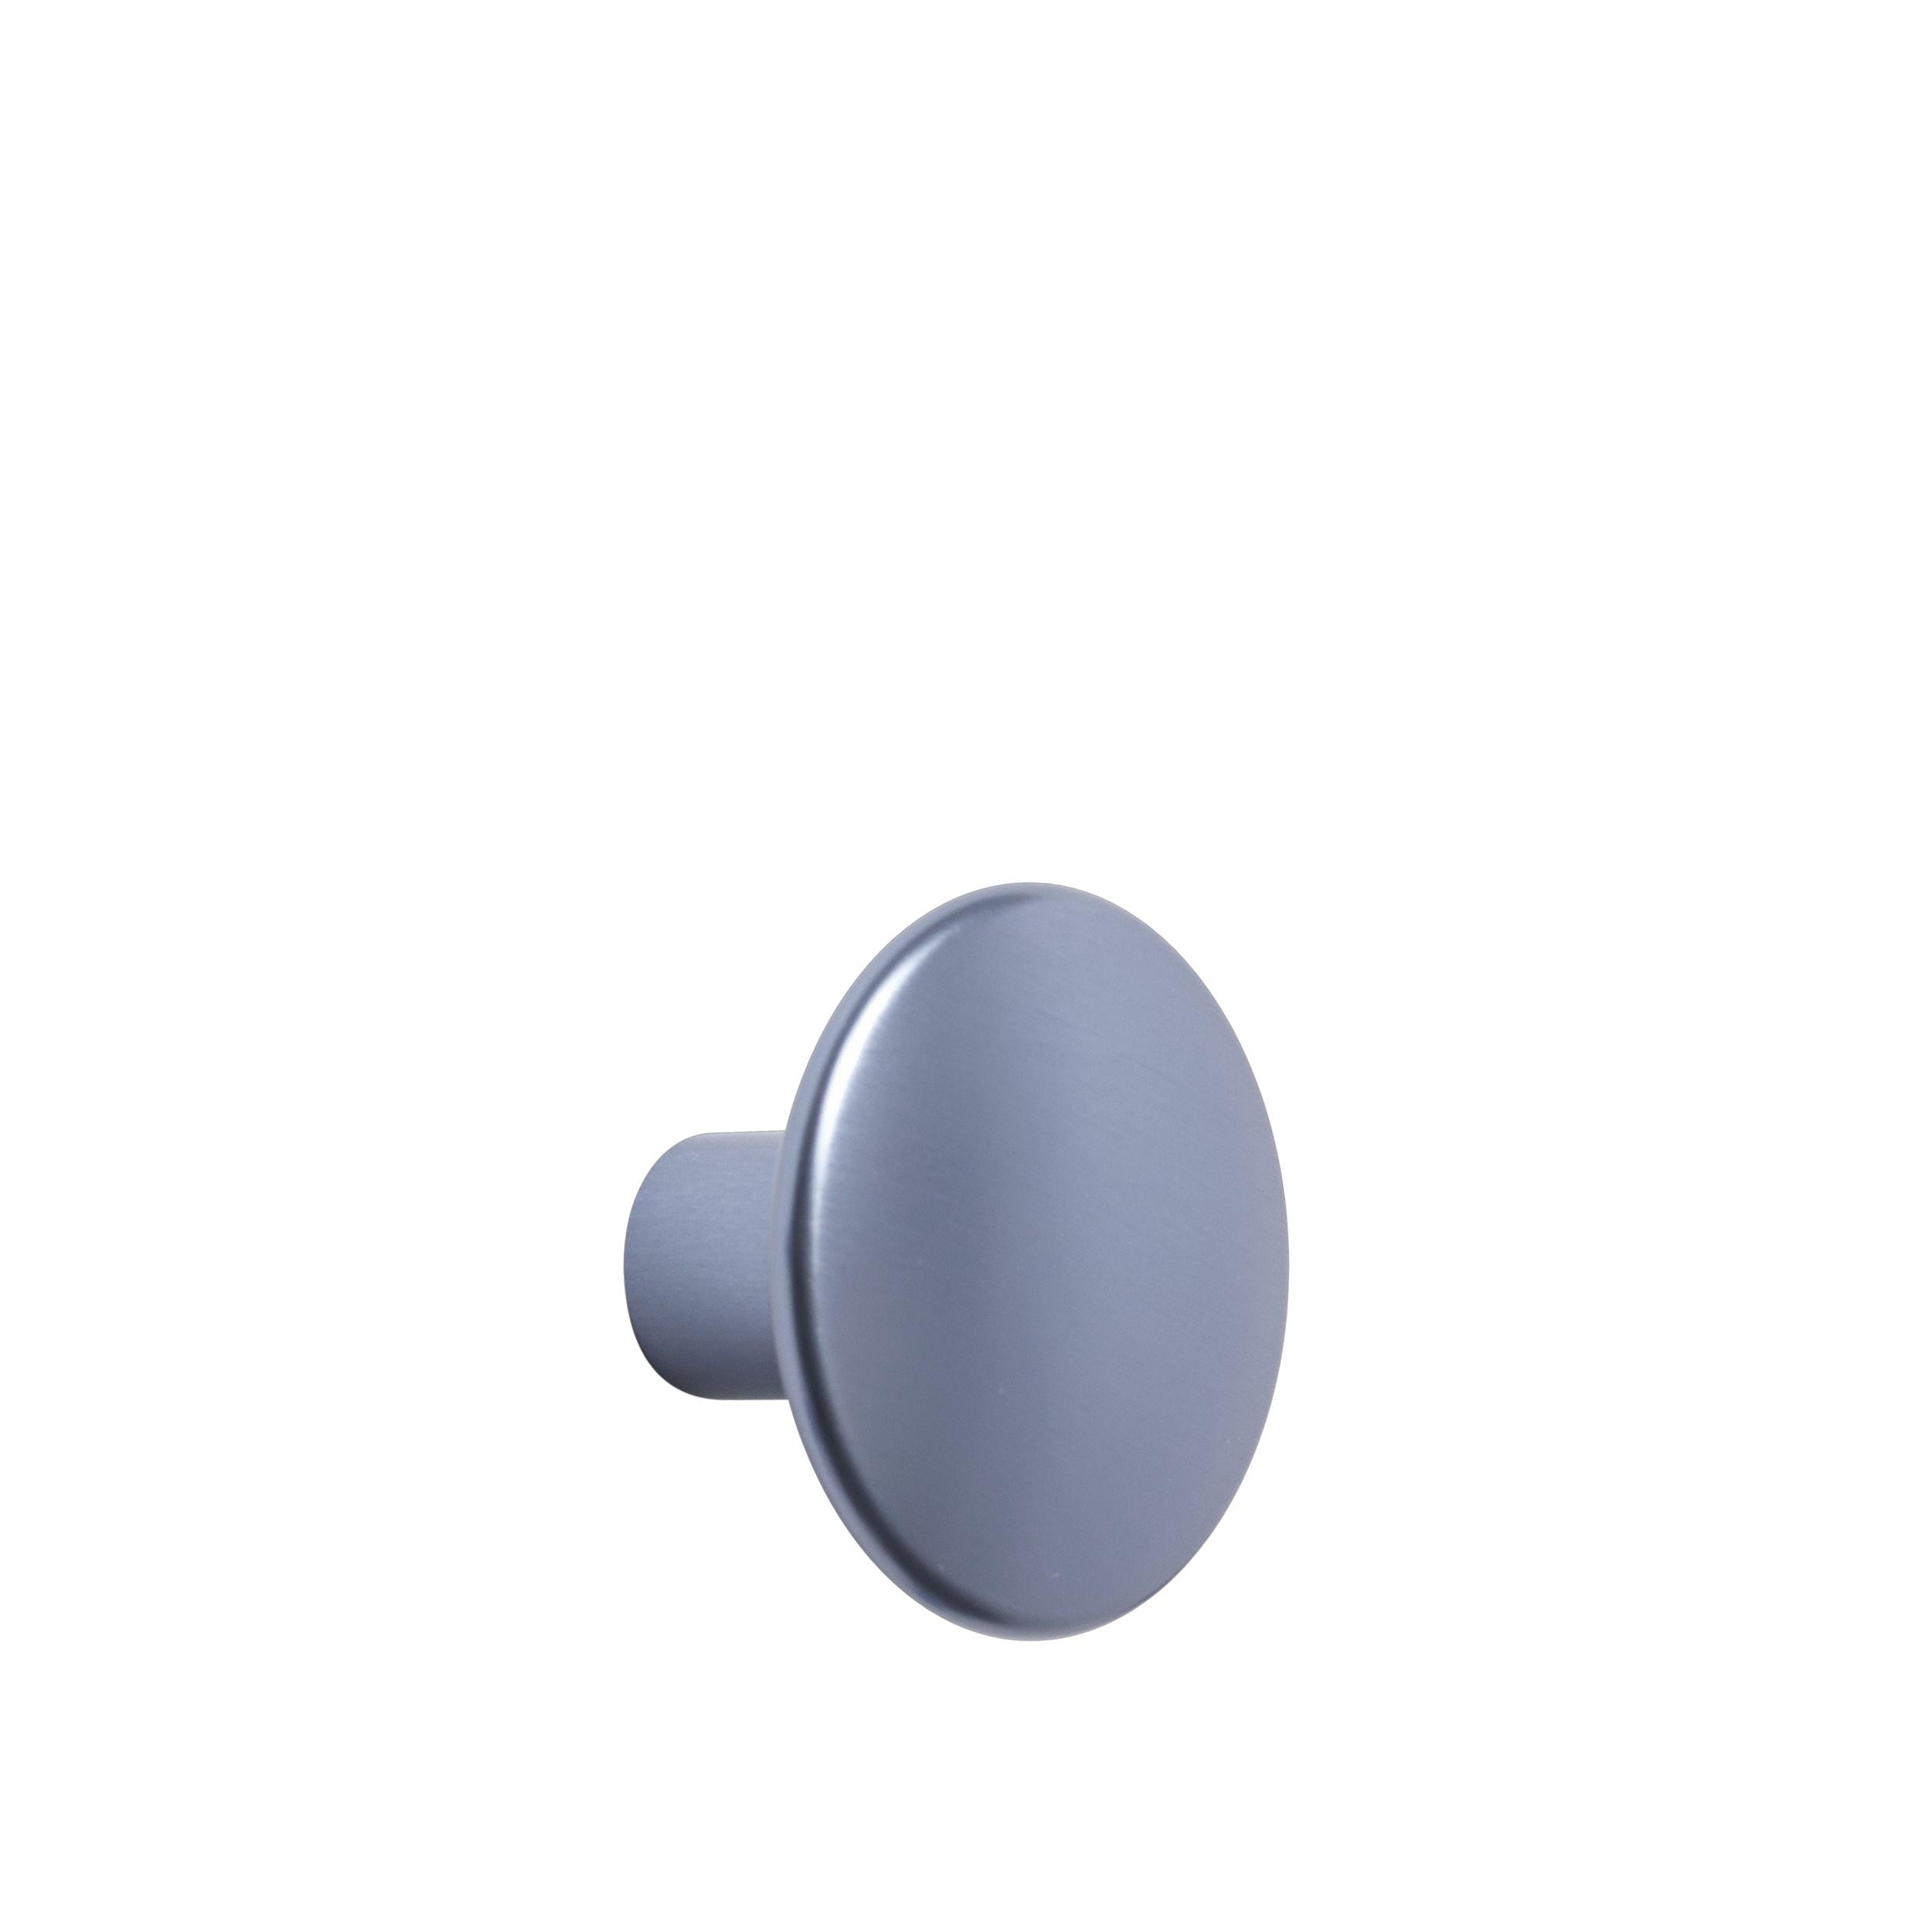 Dots metal medium Ø 3,9 cm pale blue